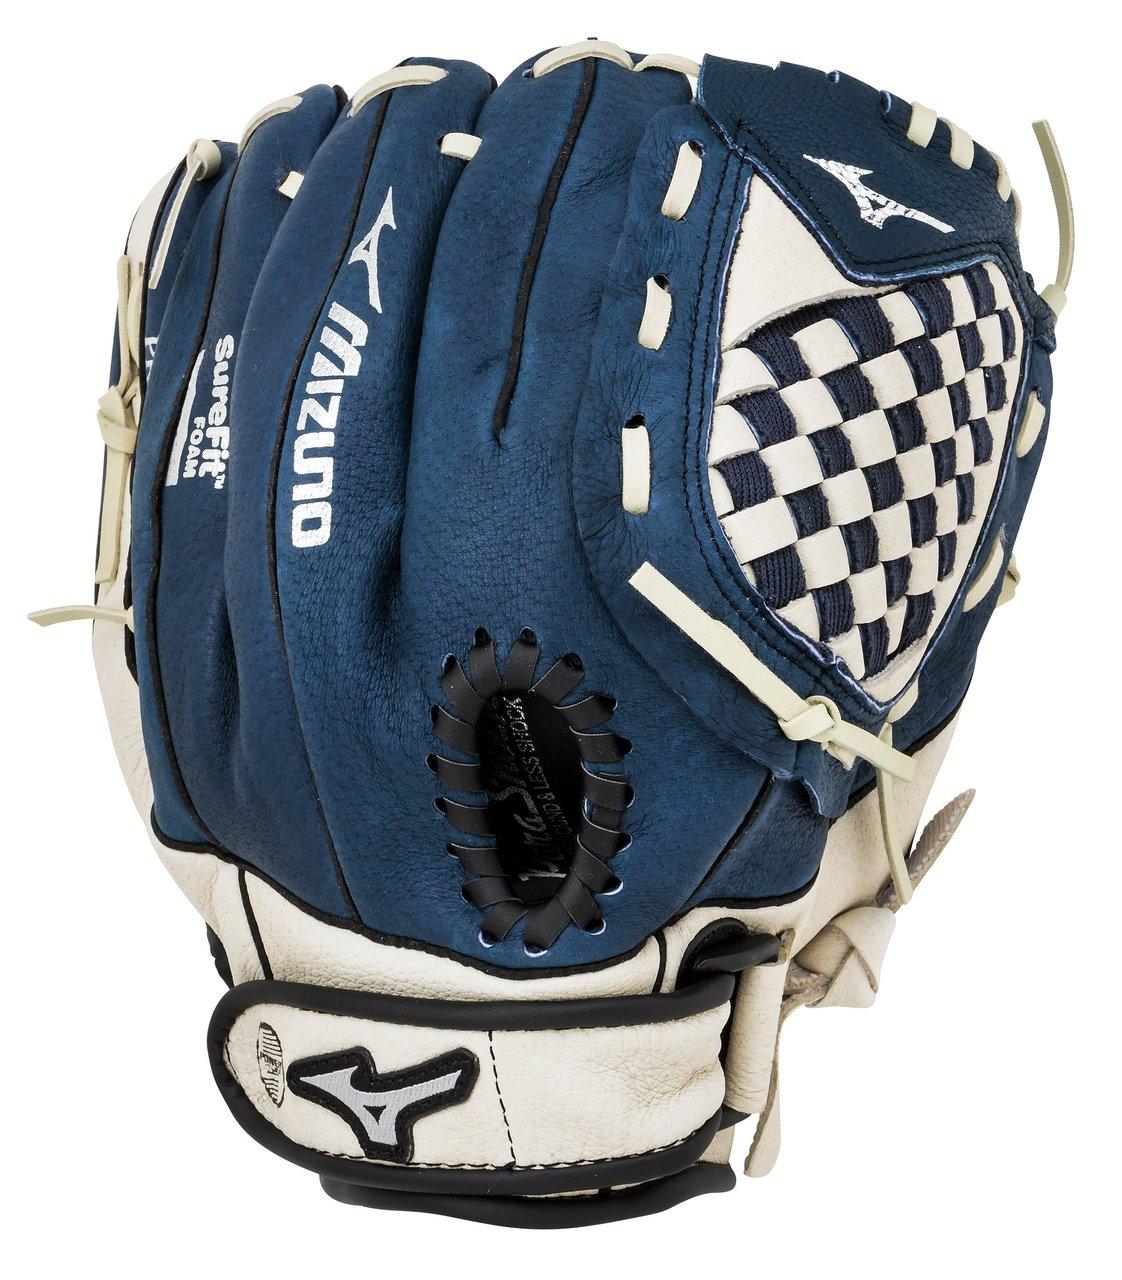 mizuno-prospect-series-11-inch-gpp1100y1-navy-youth-baseball-glove-left-handed-throw GPP1100Y1NY-Left Handed Throw Mizuno 041969127865 Mizuno Prospect Series Baseball Glove for Youth Baseball Player. Size 11